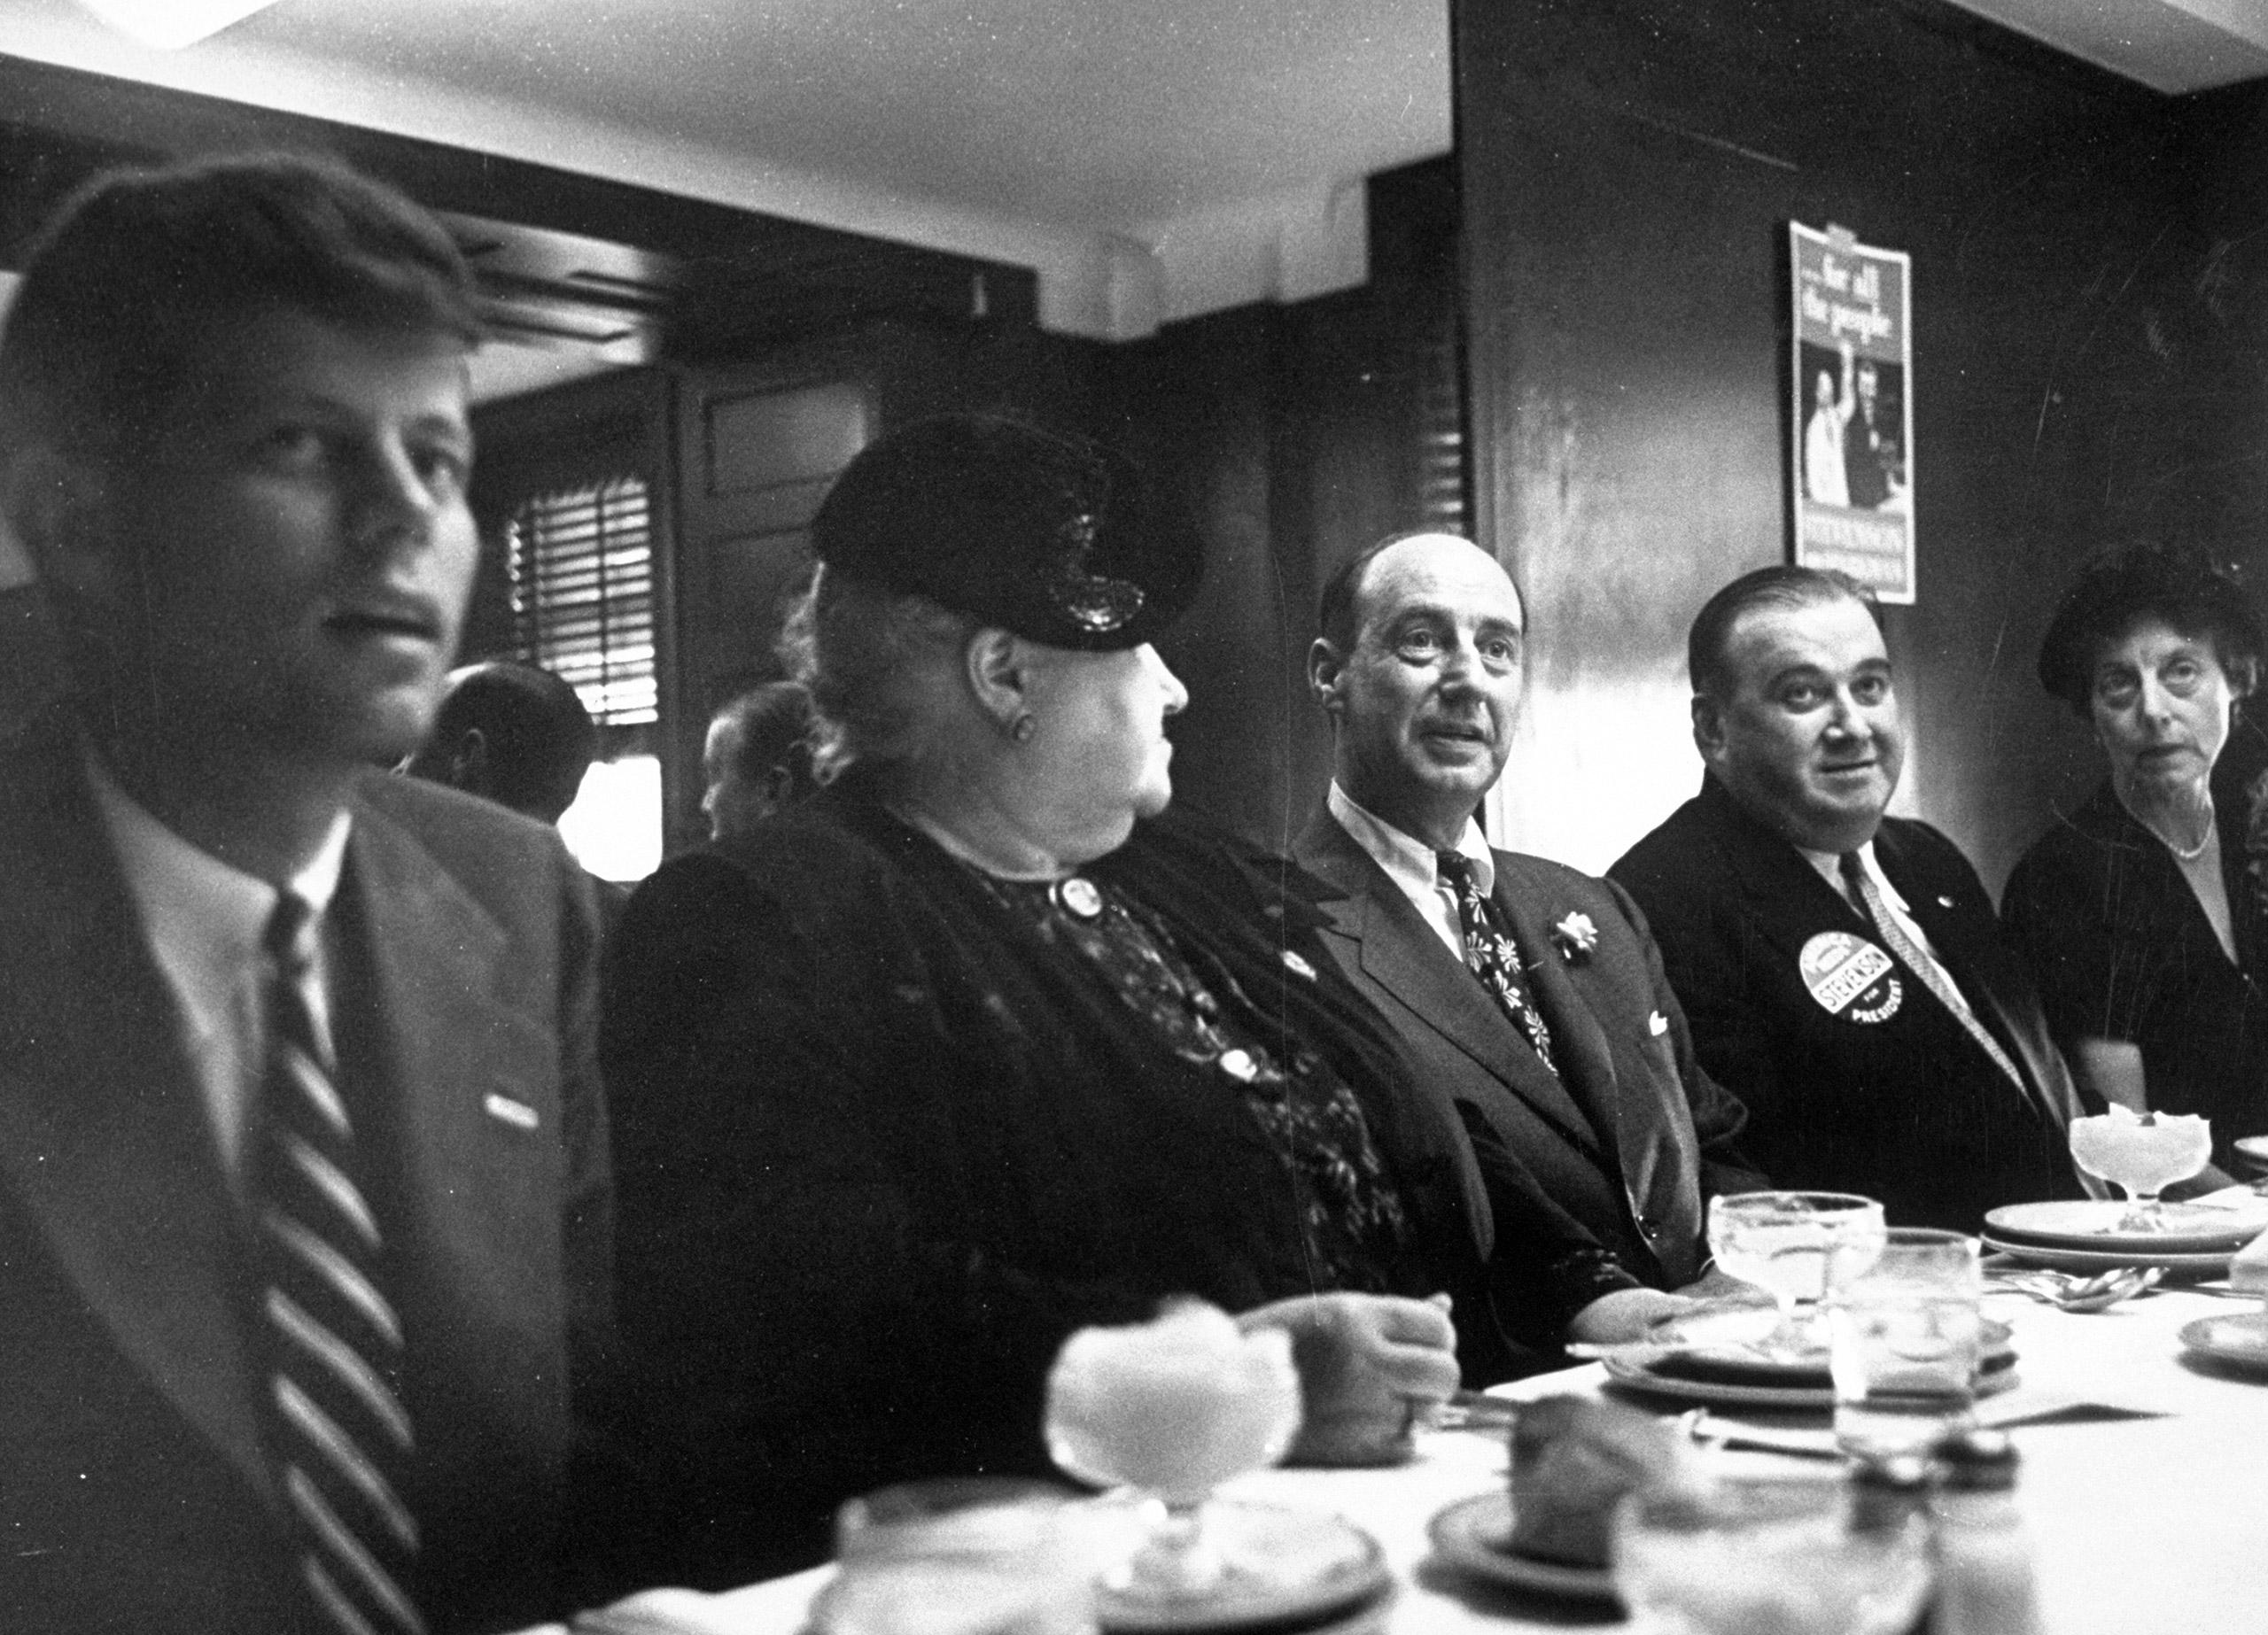 Adlai E. Stevenson (3L),  Massachusetts Governor Paul Denver (4L) and John F. Kennedy (L) during their campaign trail, eating, 1952.